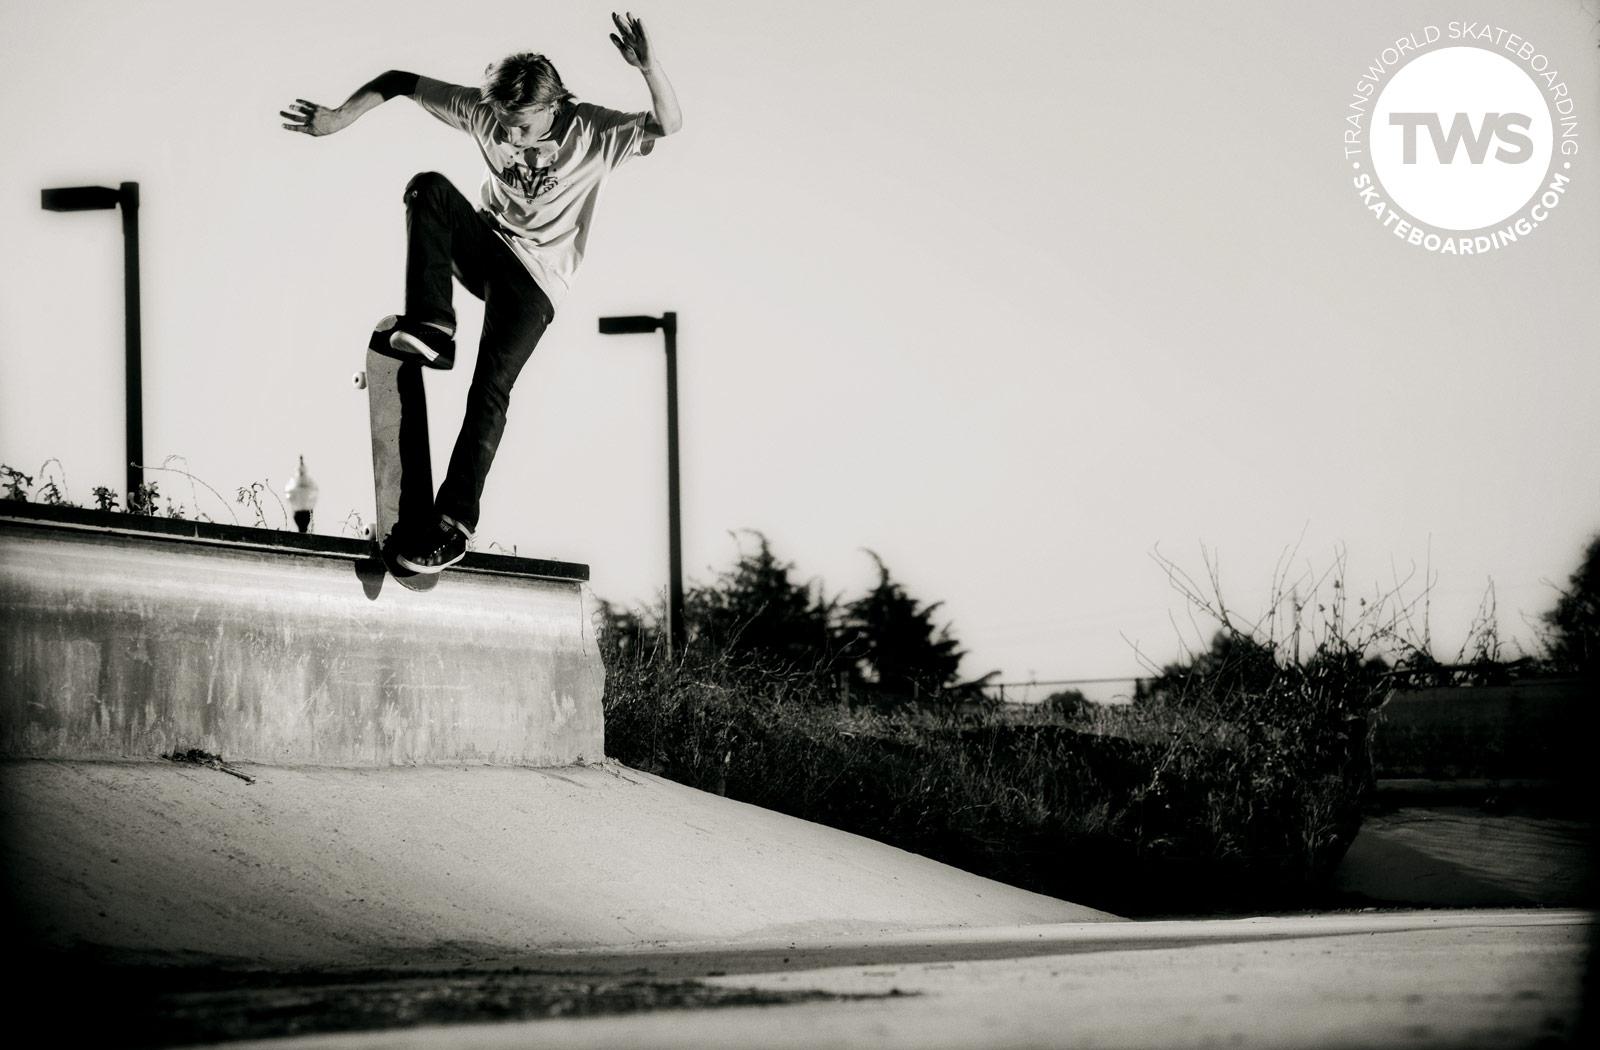 Skateboarding HD Wallpapers HD Wallpapers HD Wallpapers 360 1600x1050